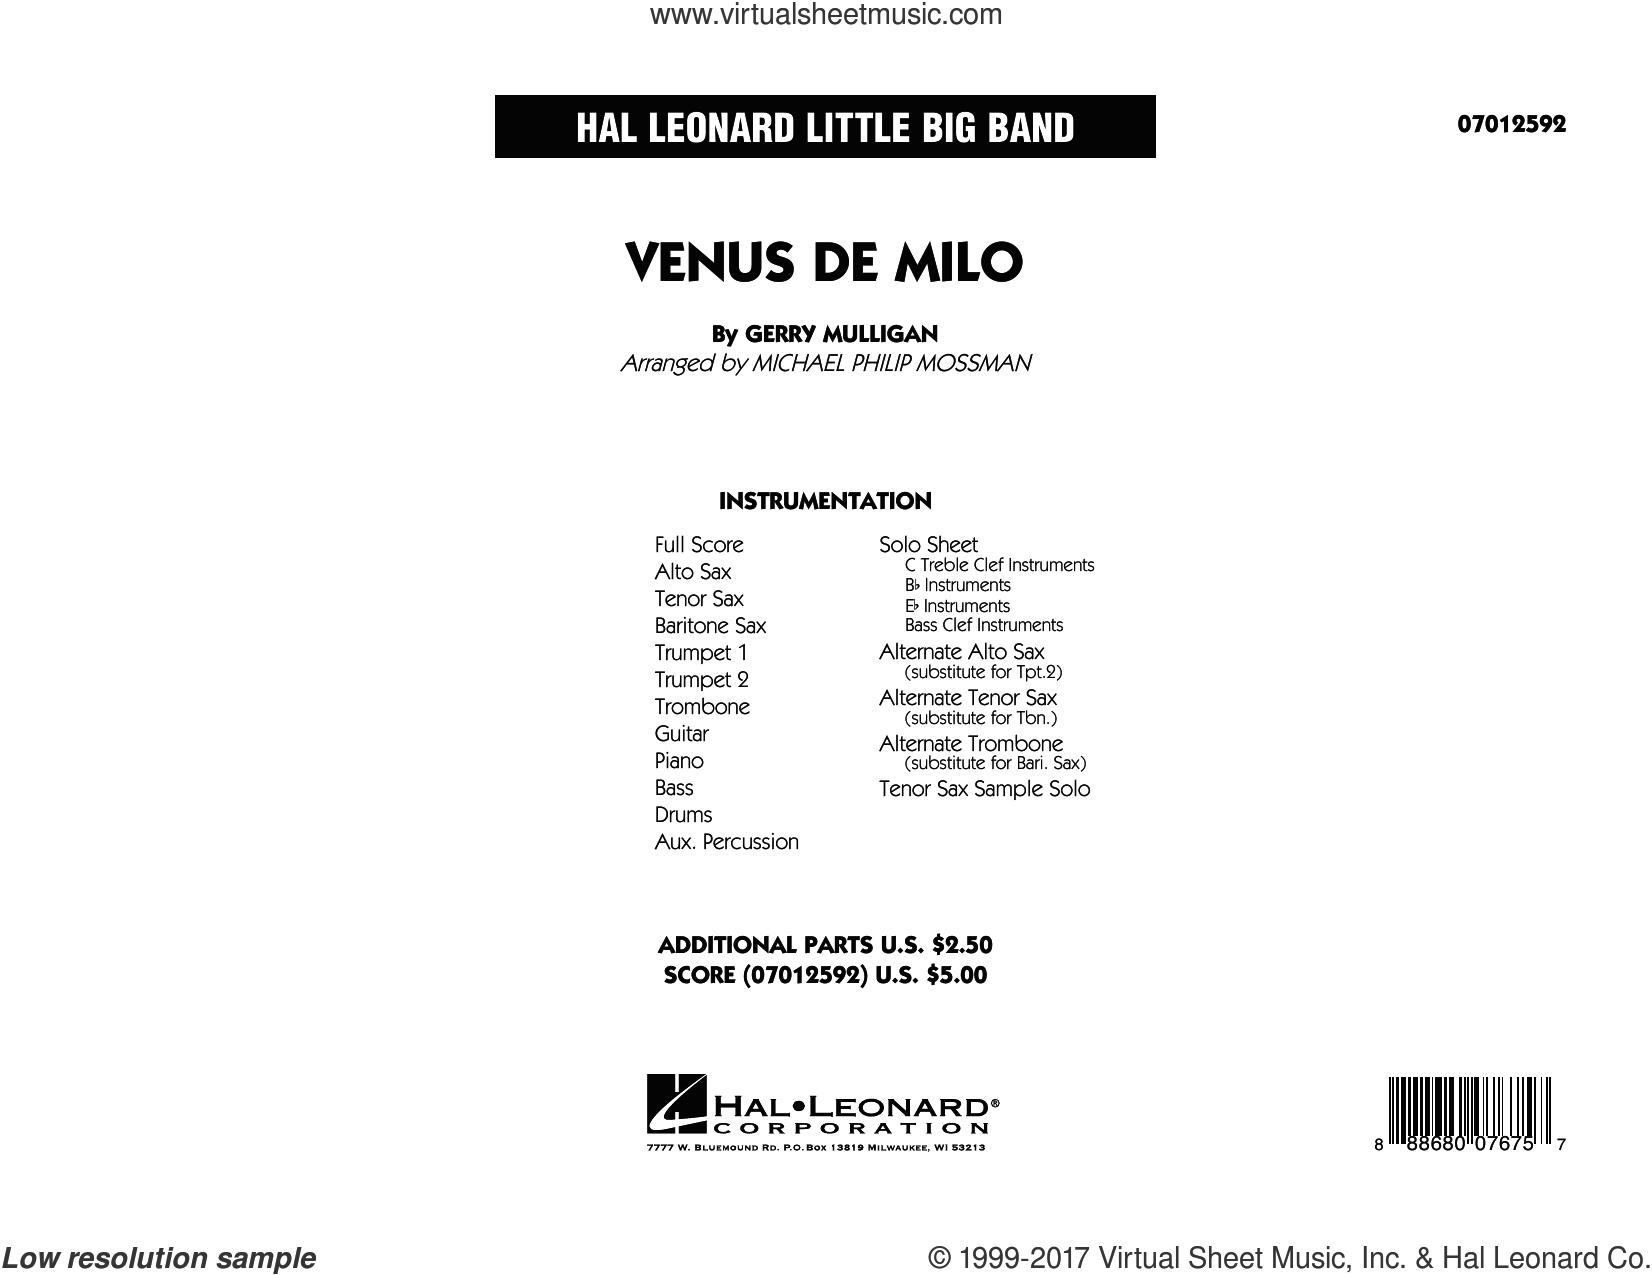 Venus de Milo (COMPLETE) sheet music for jazz band by Miles Davis, Gerry Mulligan and Michael Philip Mossman, intermediate skill level